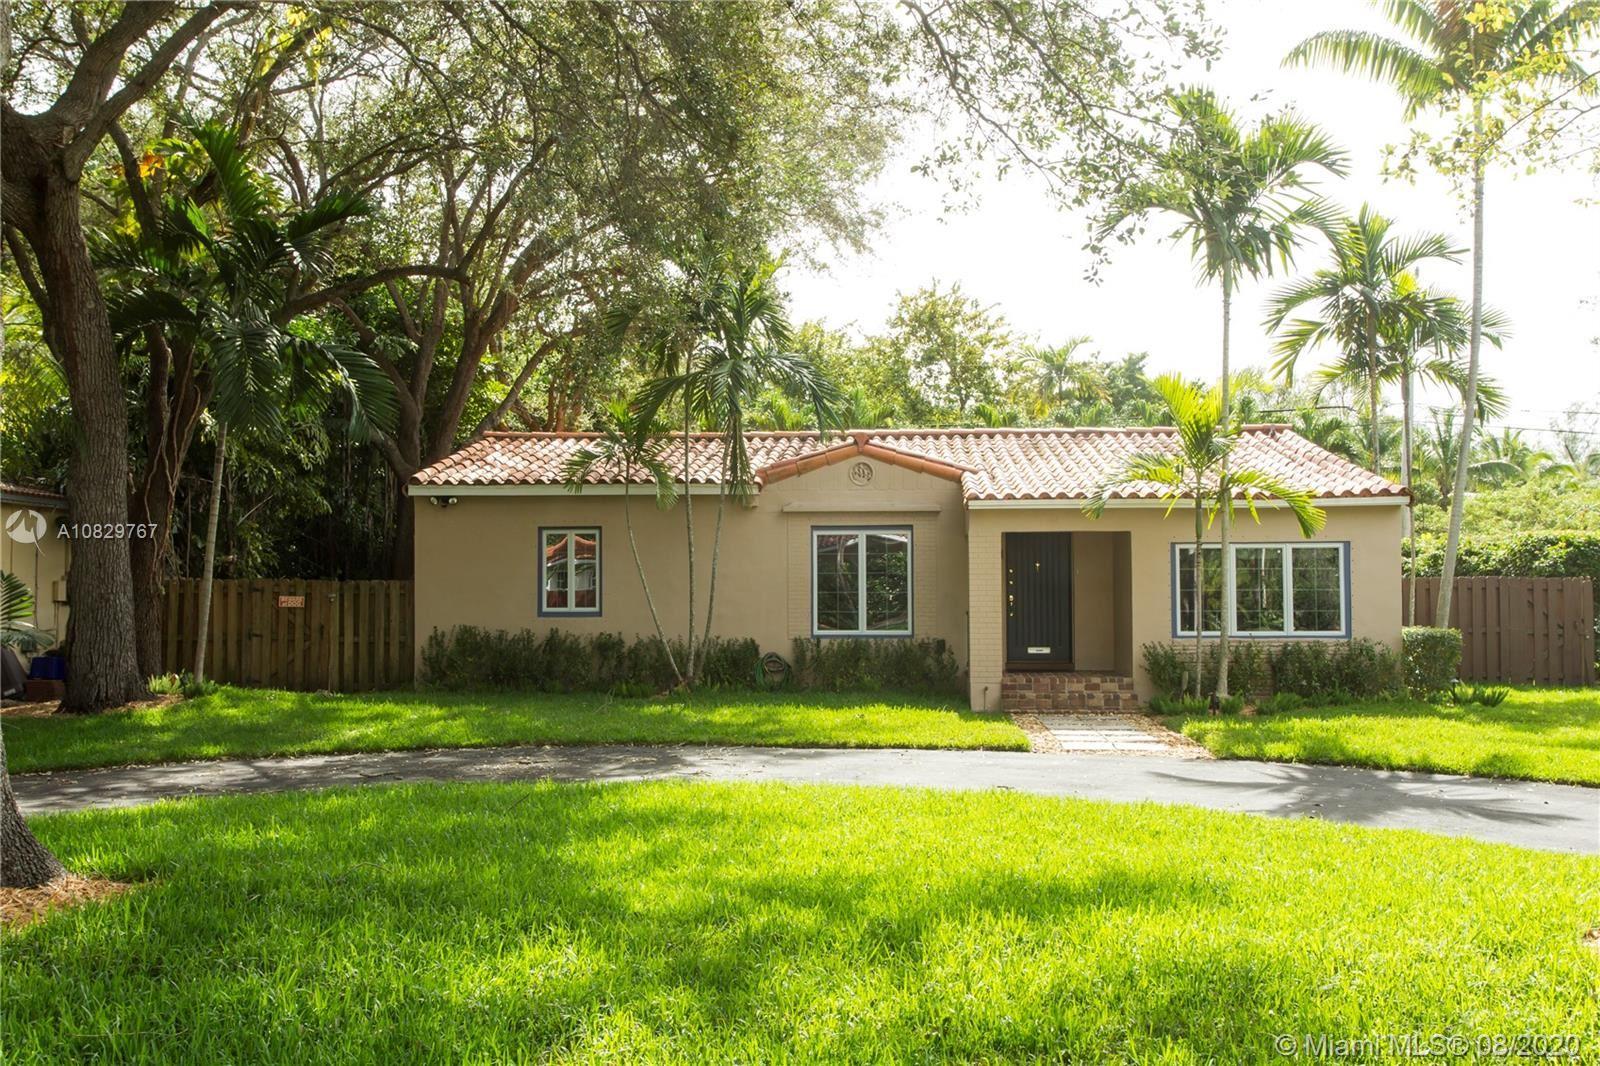 4090 Hardie Ave, Miami, FL 33133 - #: A10829767